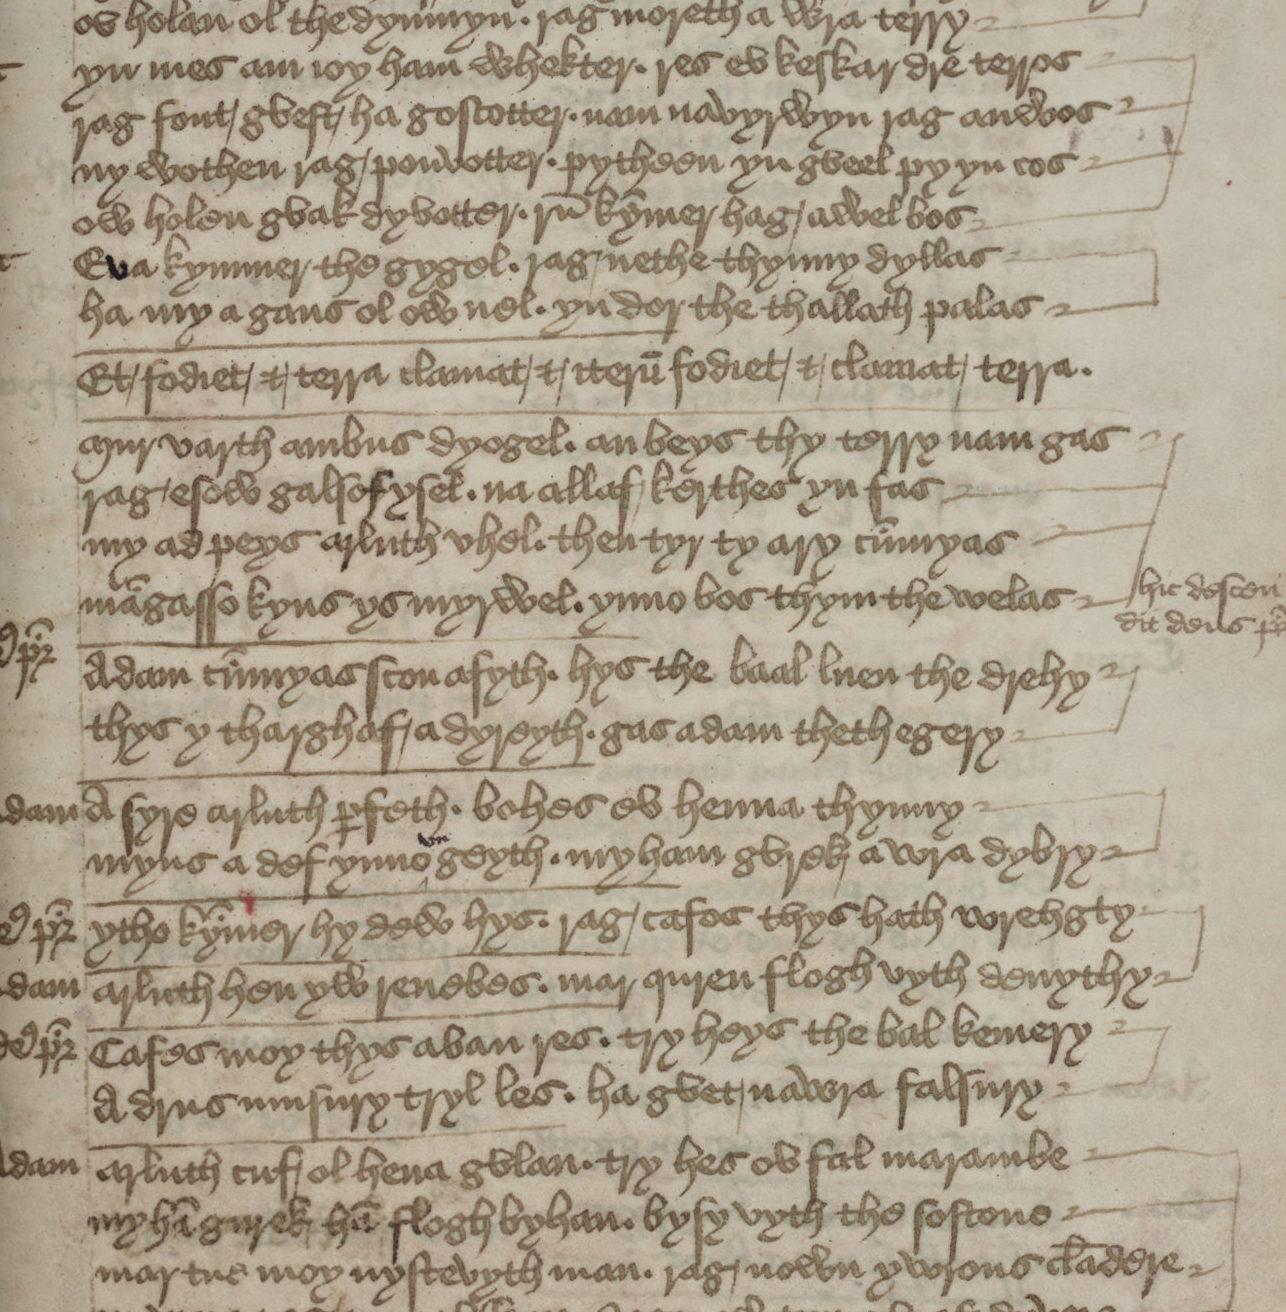 Scan of handwritten historic document